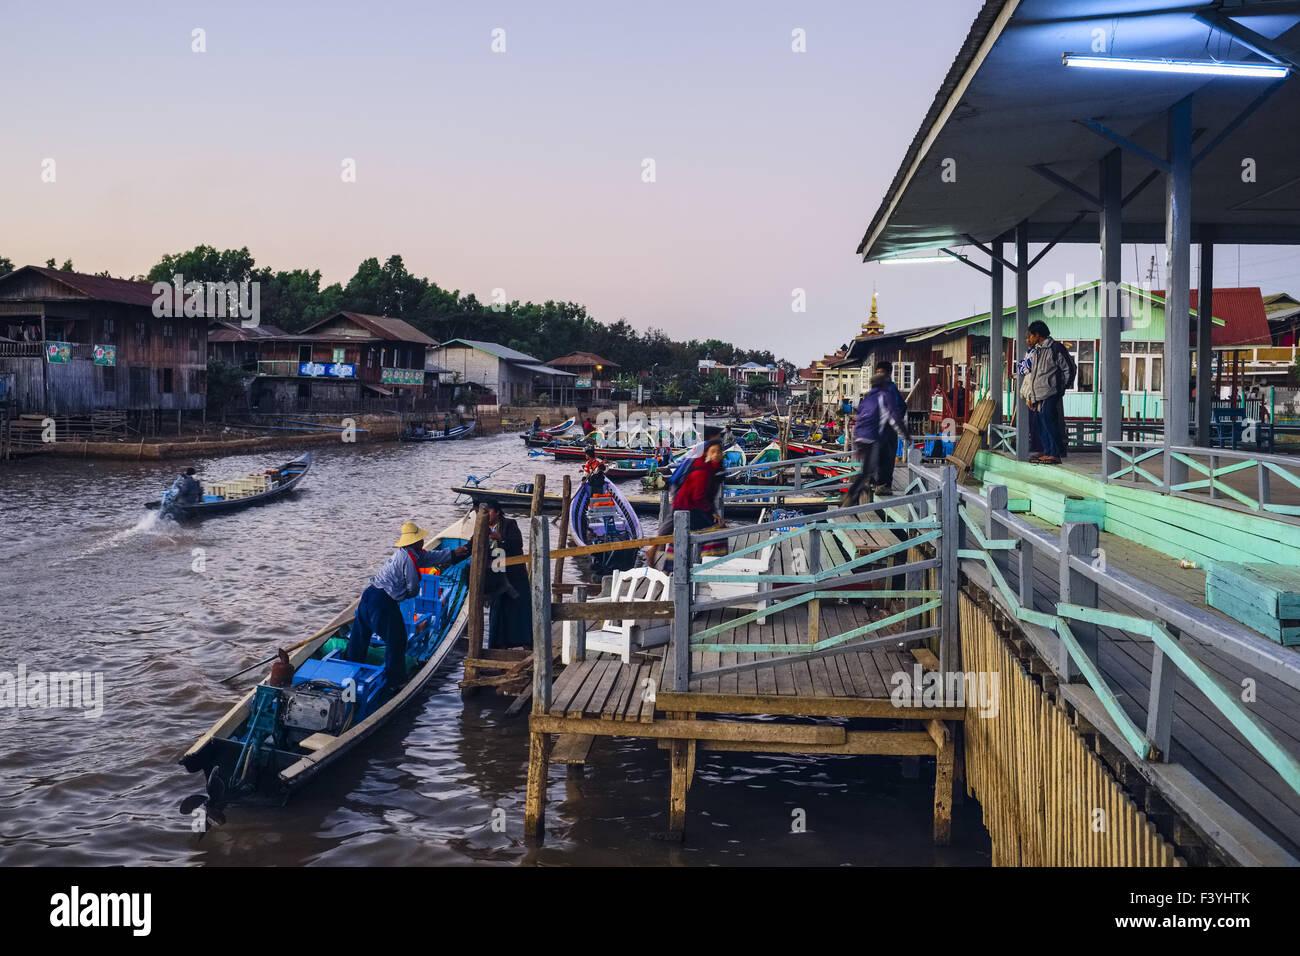 Jetty, Nyaung Shwe, Myanmar, Asia Stock Photo: 88502531 - Alamy